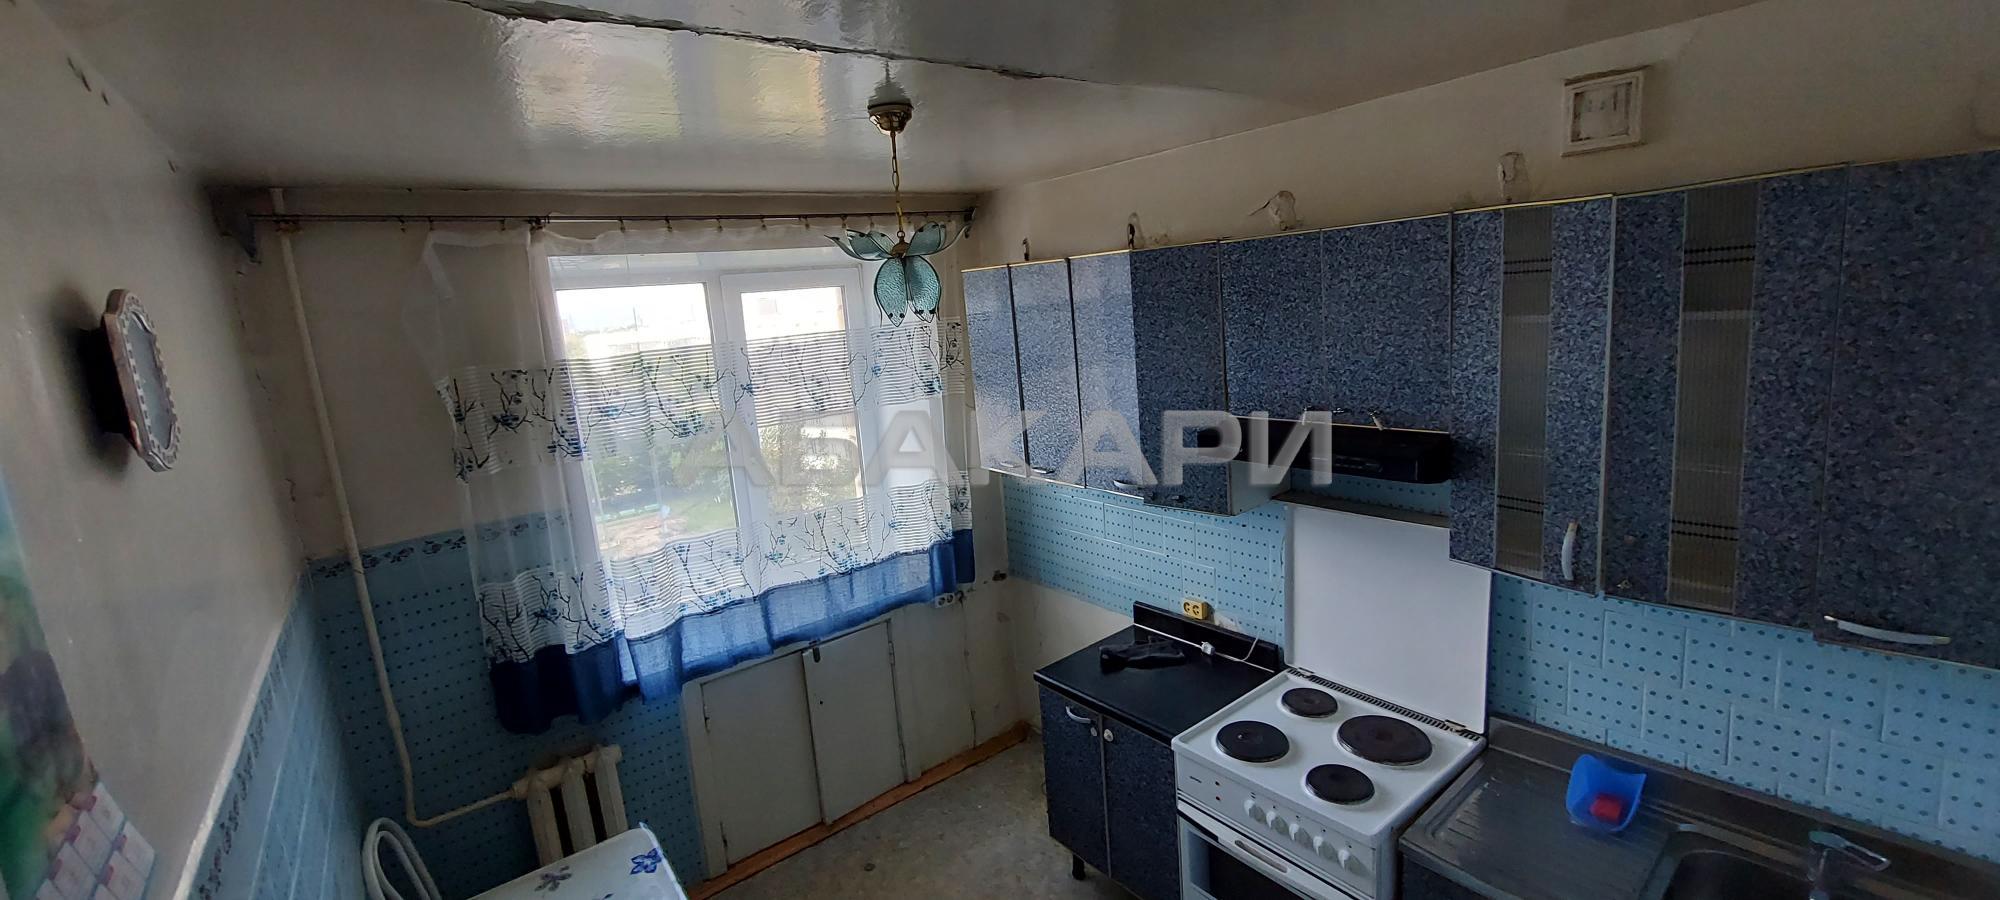 3к квартира ул. Партизанская, 70   20000   аренда в Красноярске фото 5